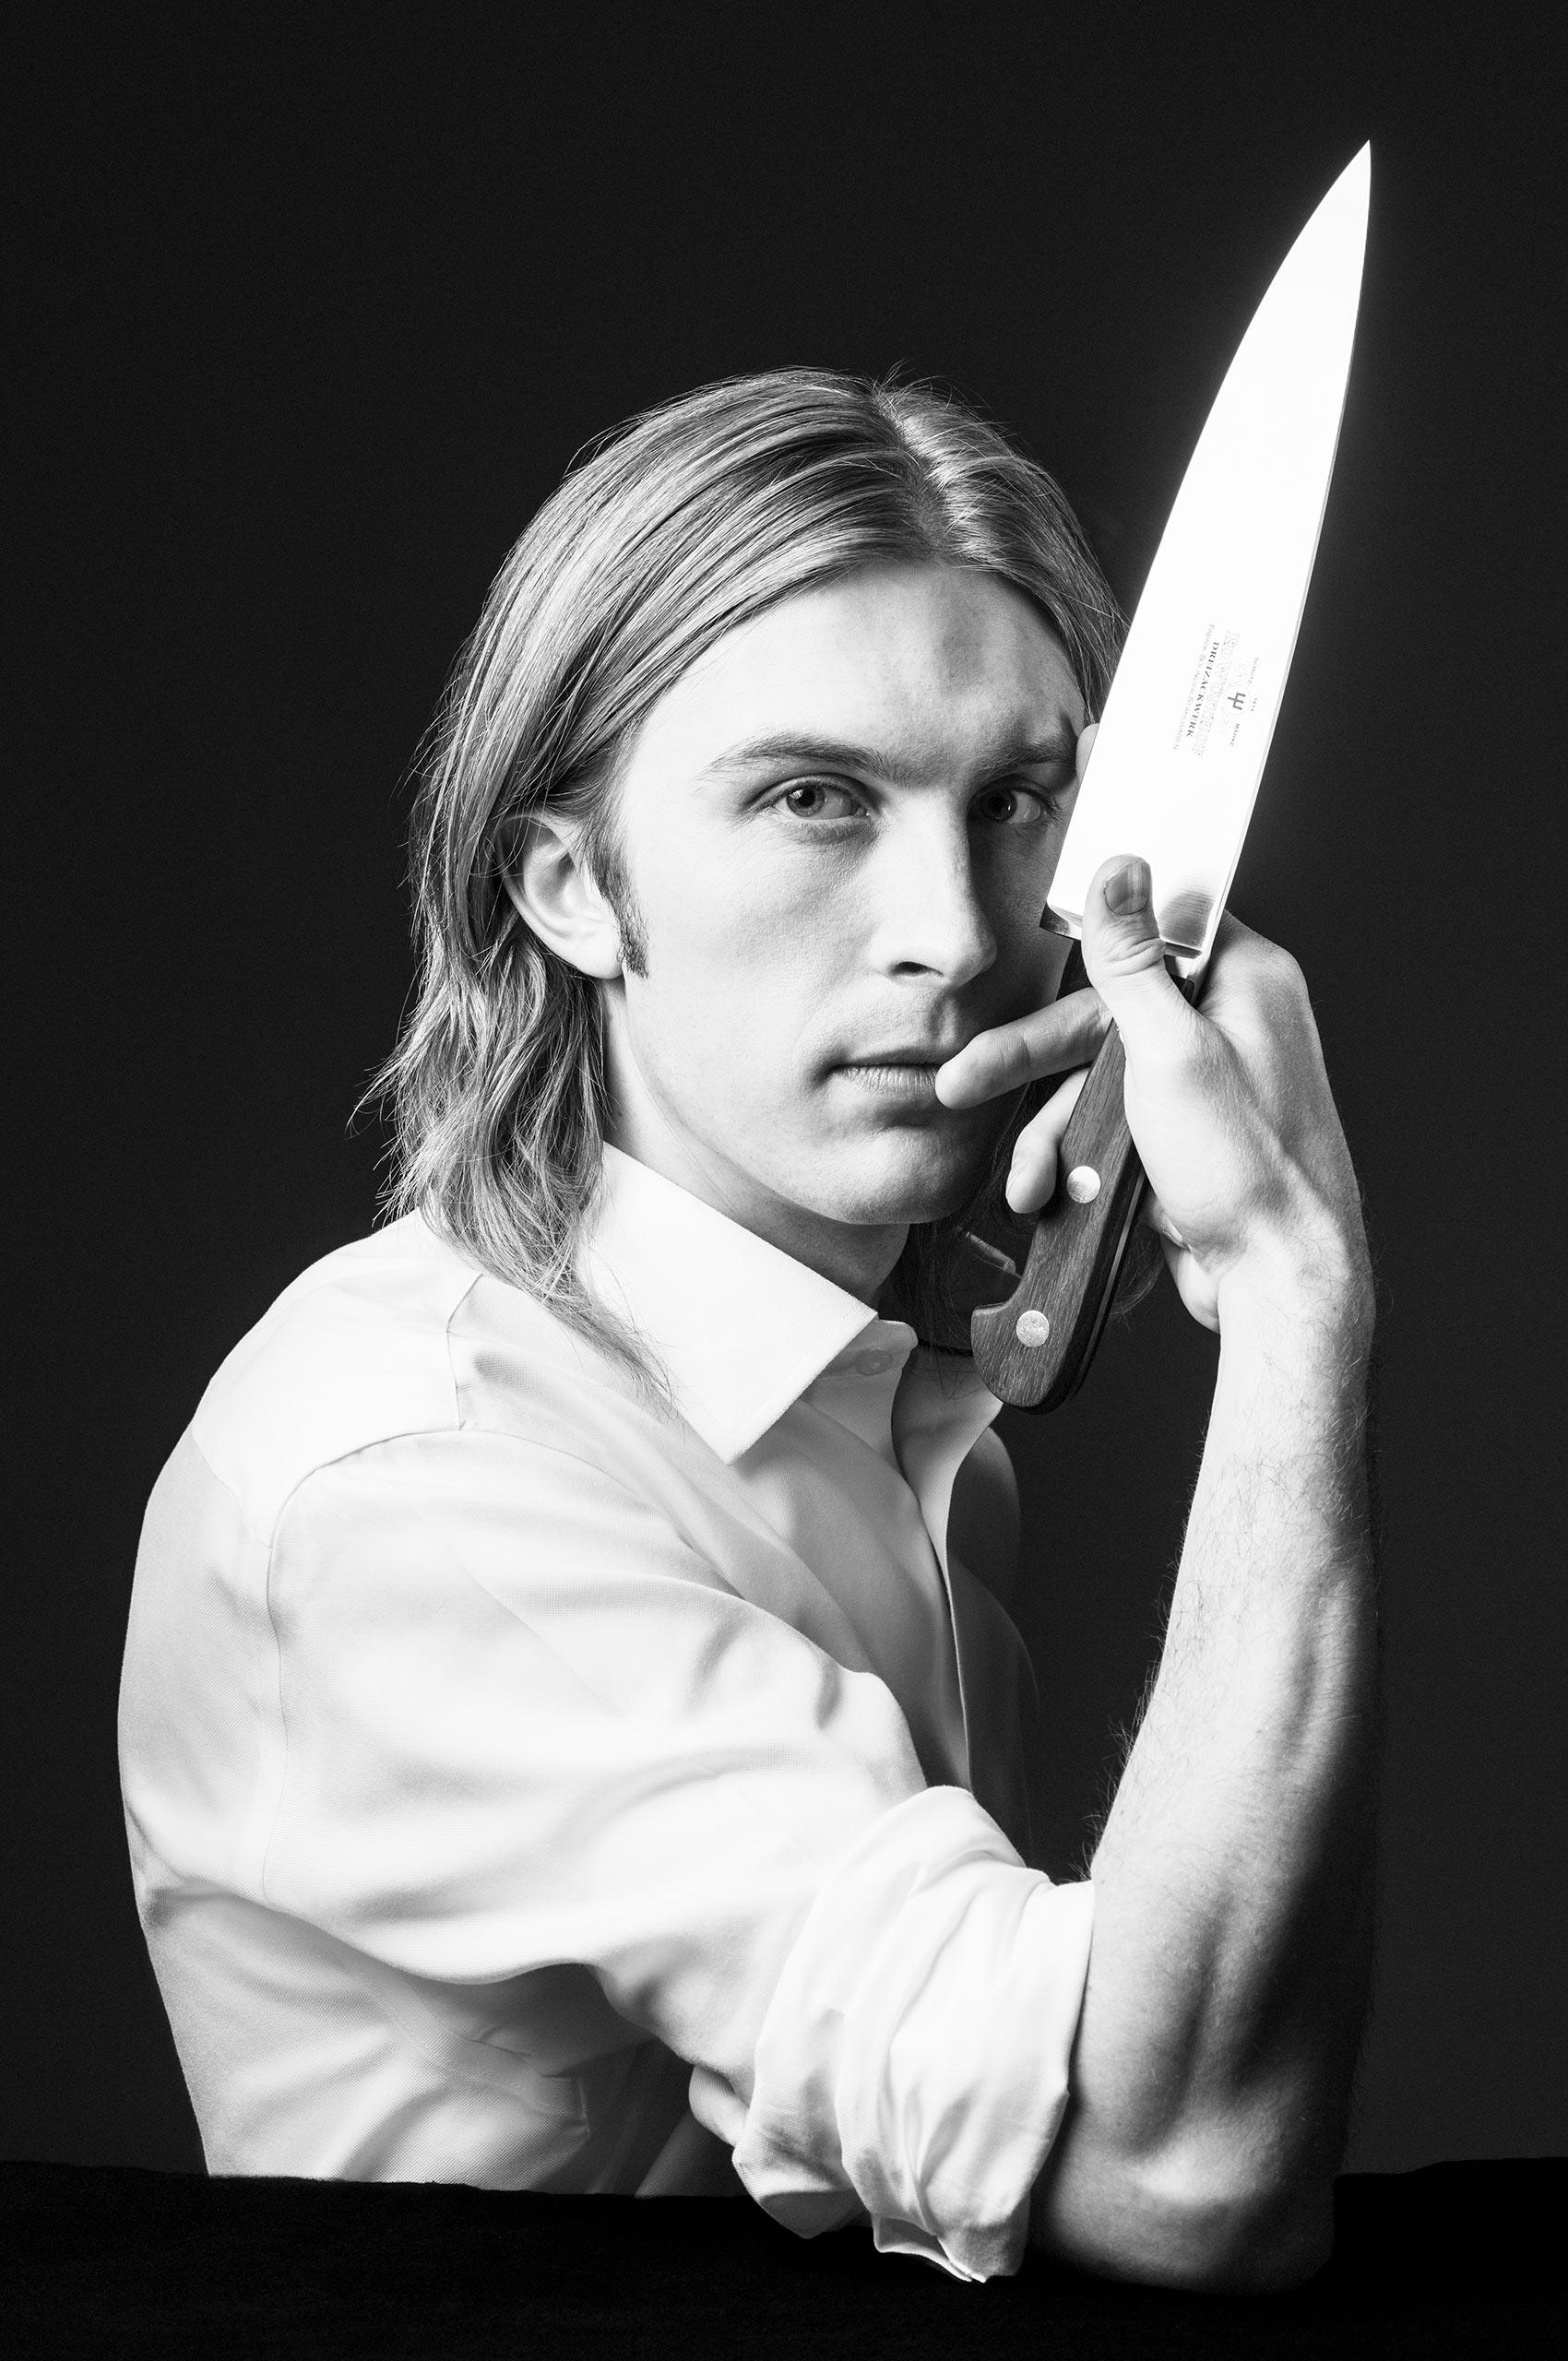 Clayton-Chapman-2bw-by-Henrik-Olund-Photography.jpg